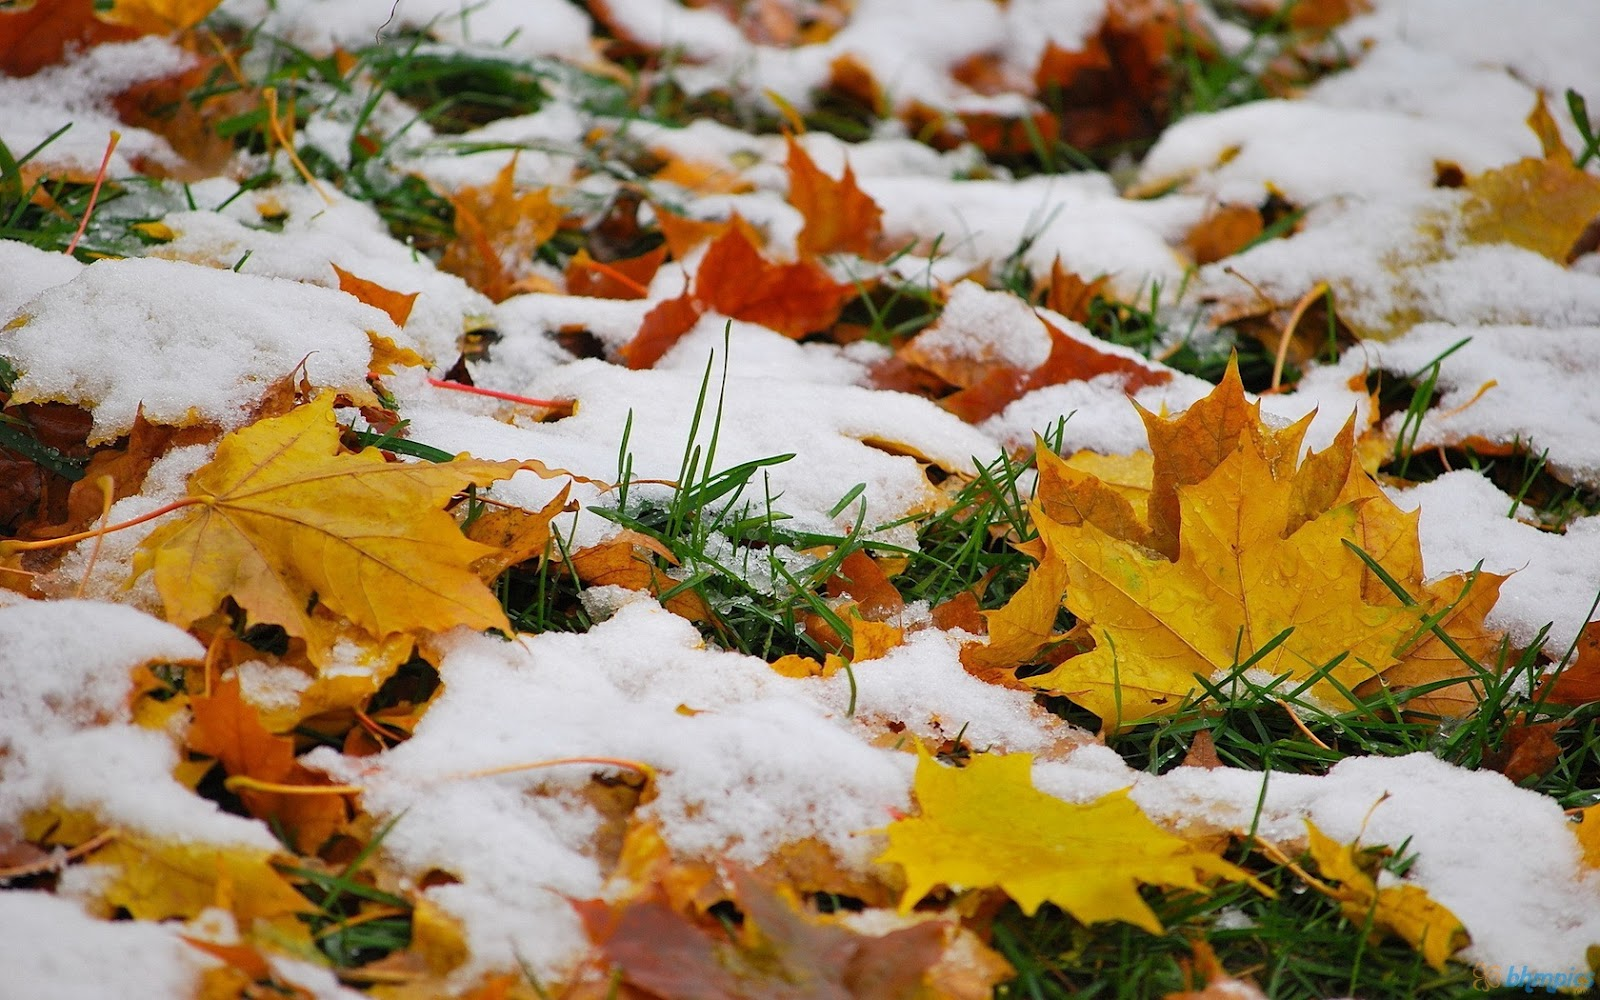 Snow On Autumn Leaves Wallpaper Snow On Autumn Leaves Wallpaper 1600x1000